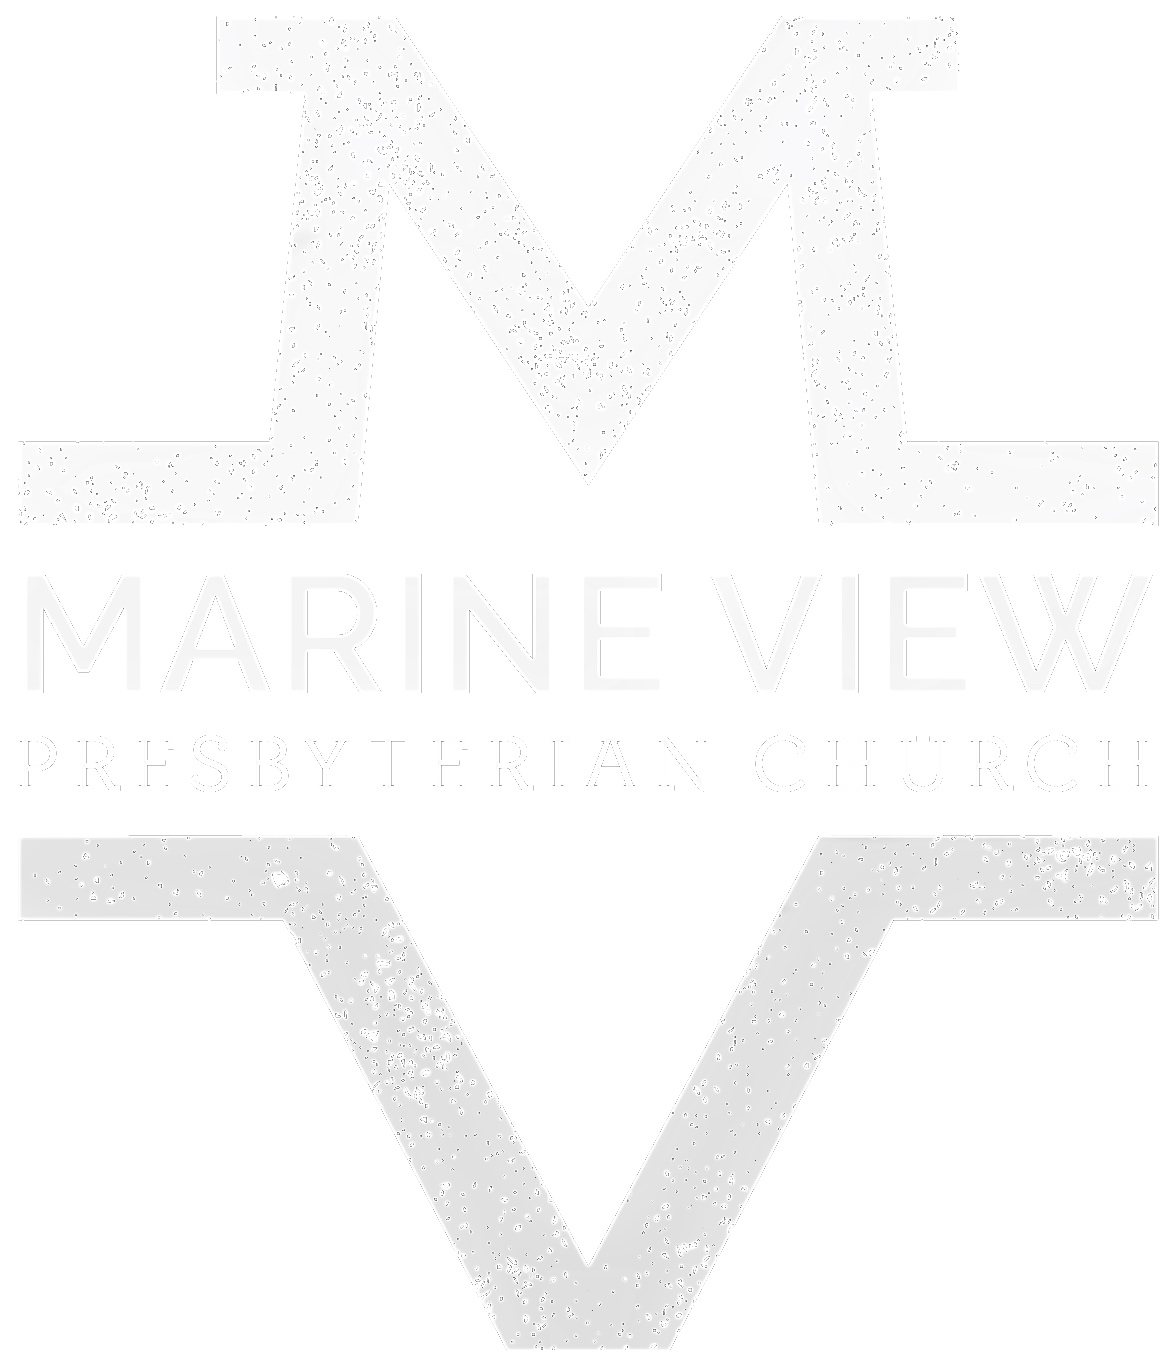 PRESCHOOL — Marine View Presbyterian Church